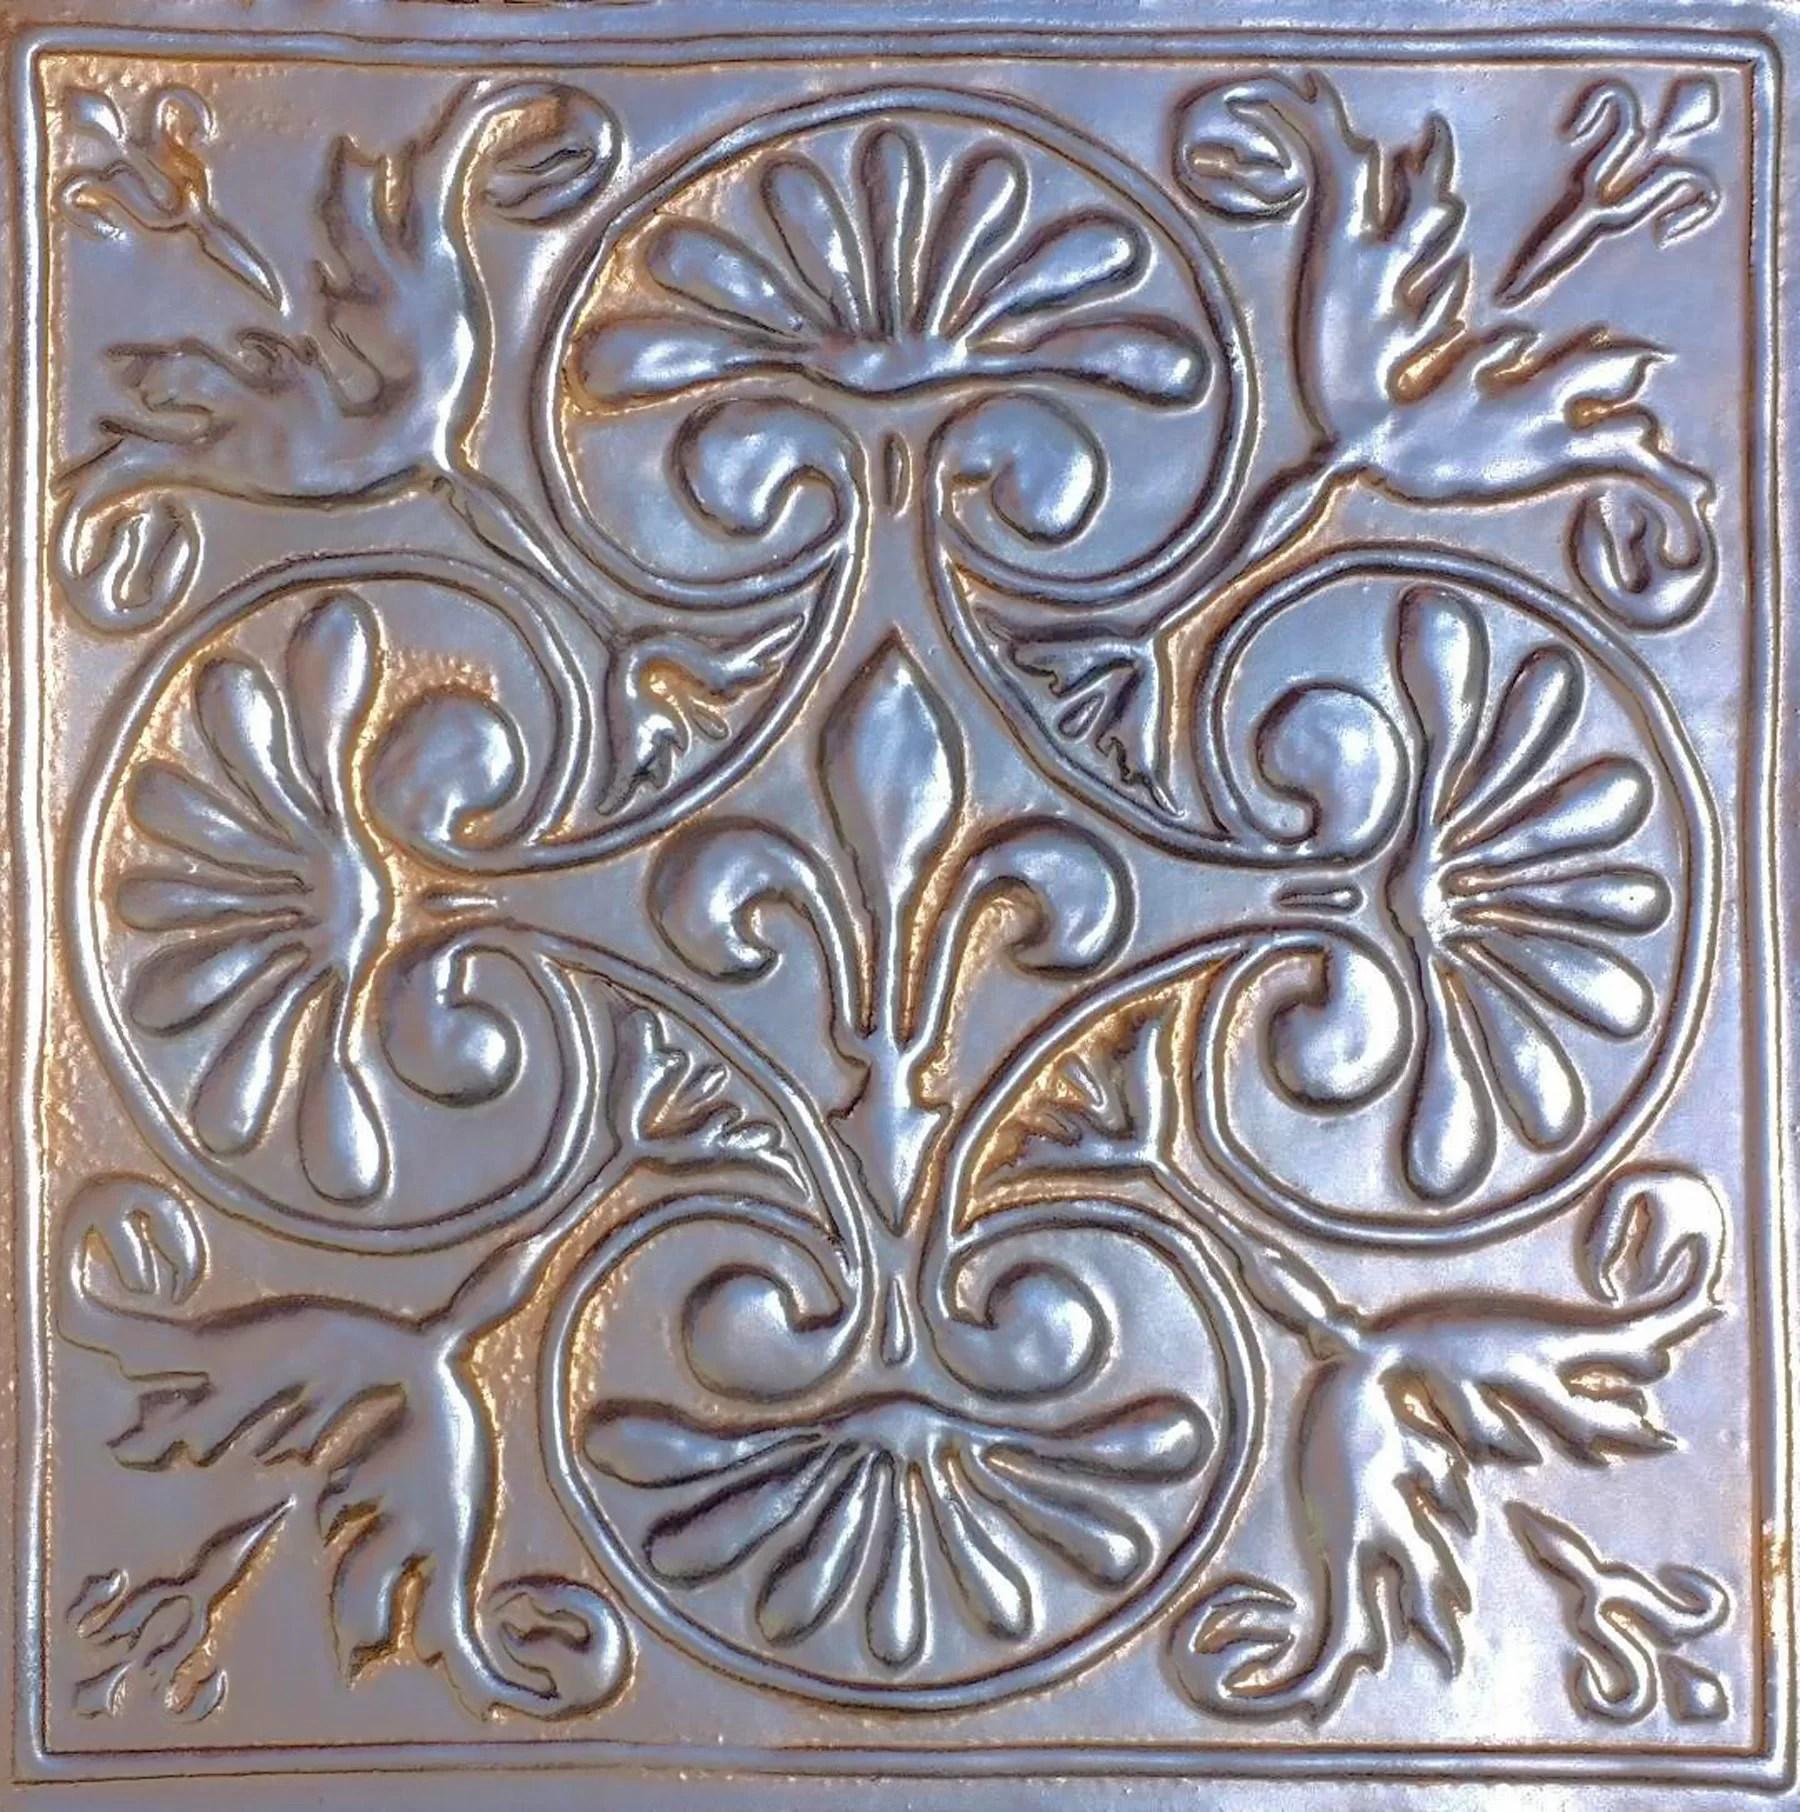 14 x 14 ceramic fleurdelis medallion tile in bronze